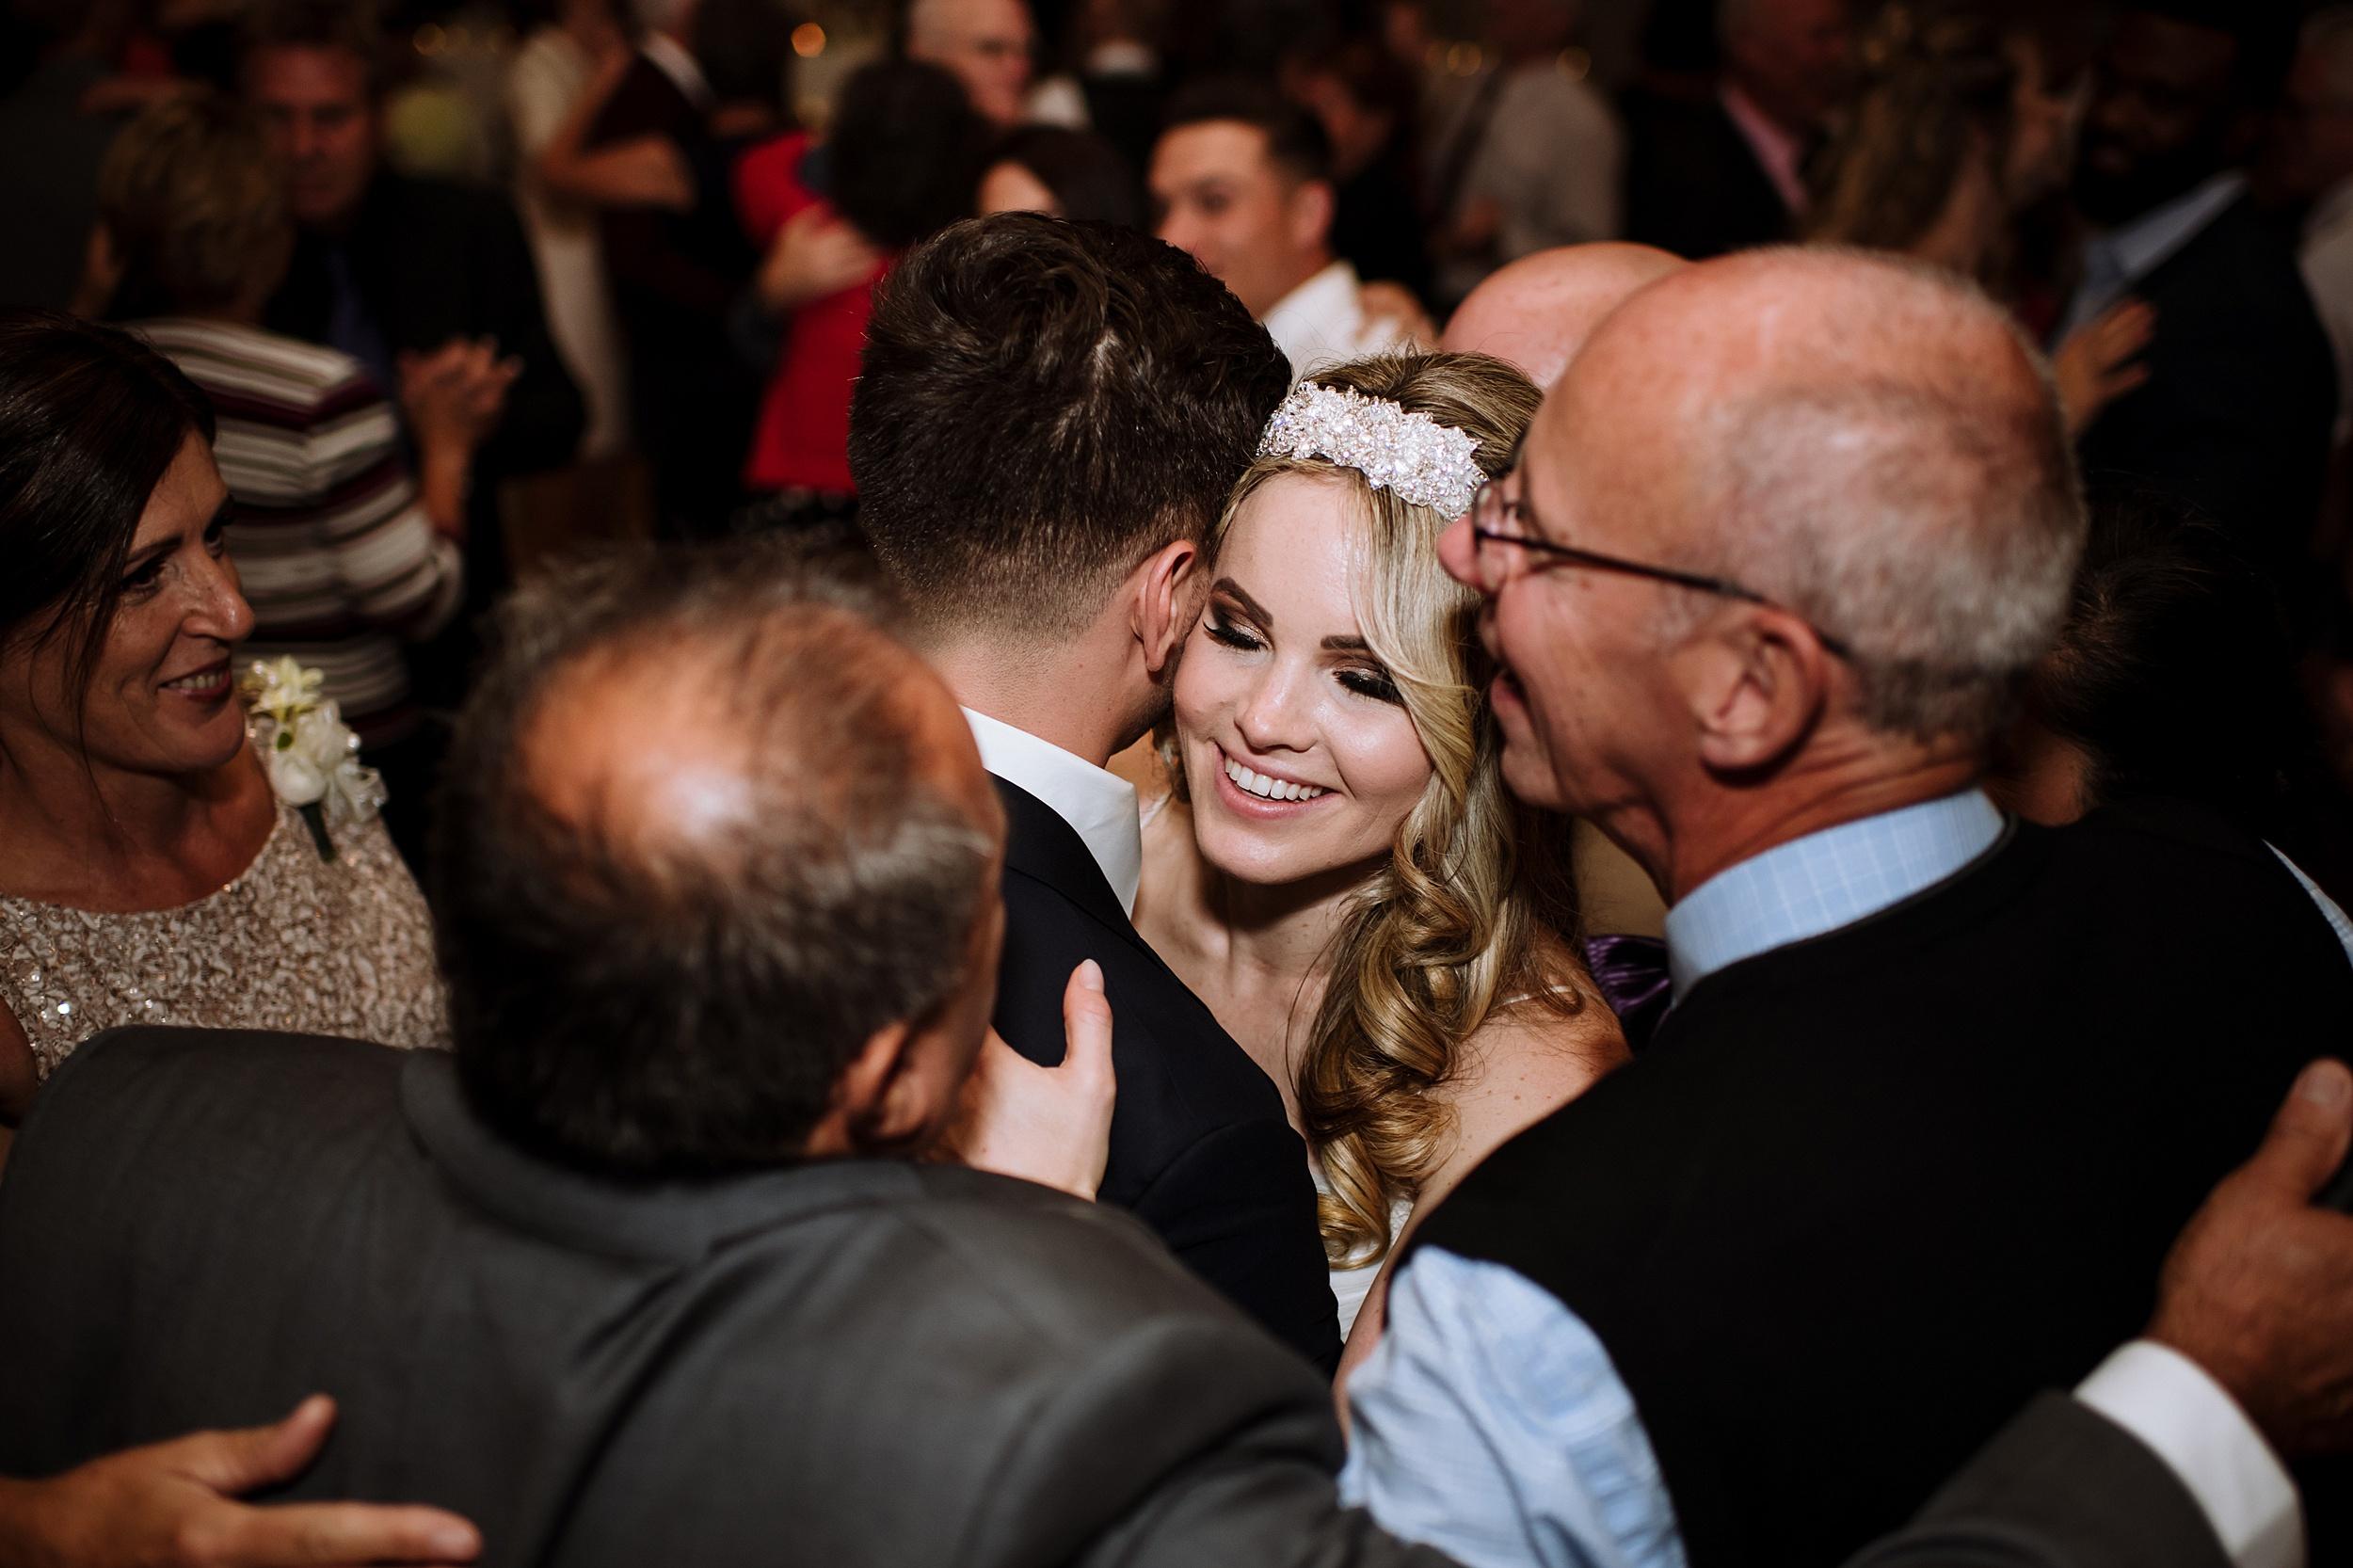 McMichael_Art_Collection_Wedding_chateau_le_jardin_Justine_Munro_Toronto_Photographer088.jpg